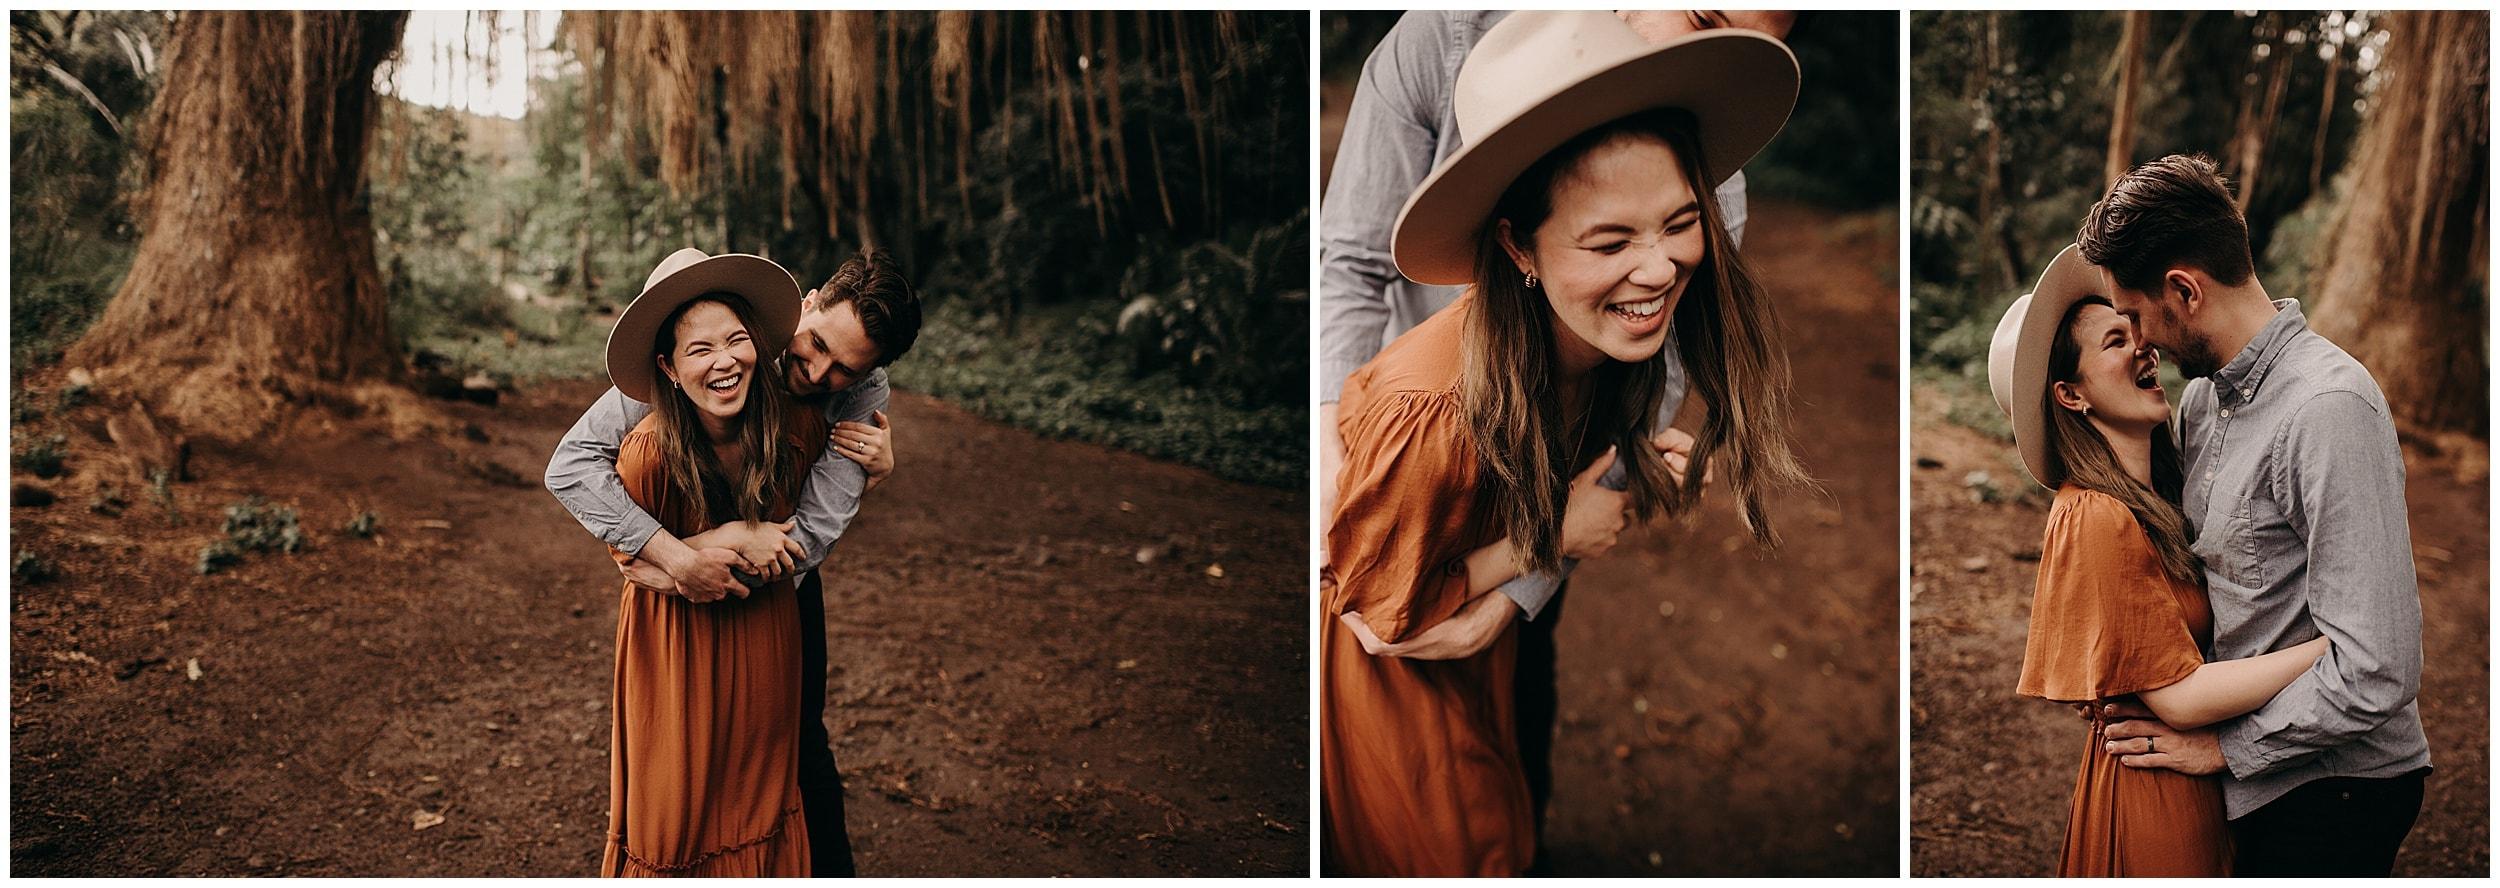 Maui couples photographer_0017